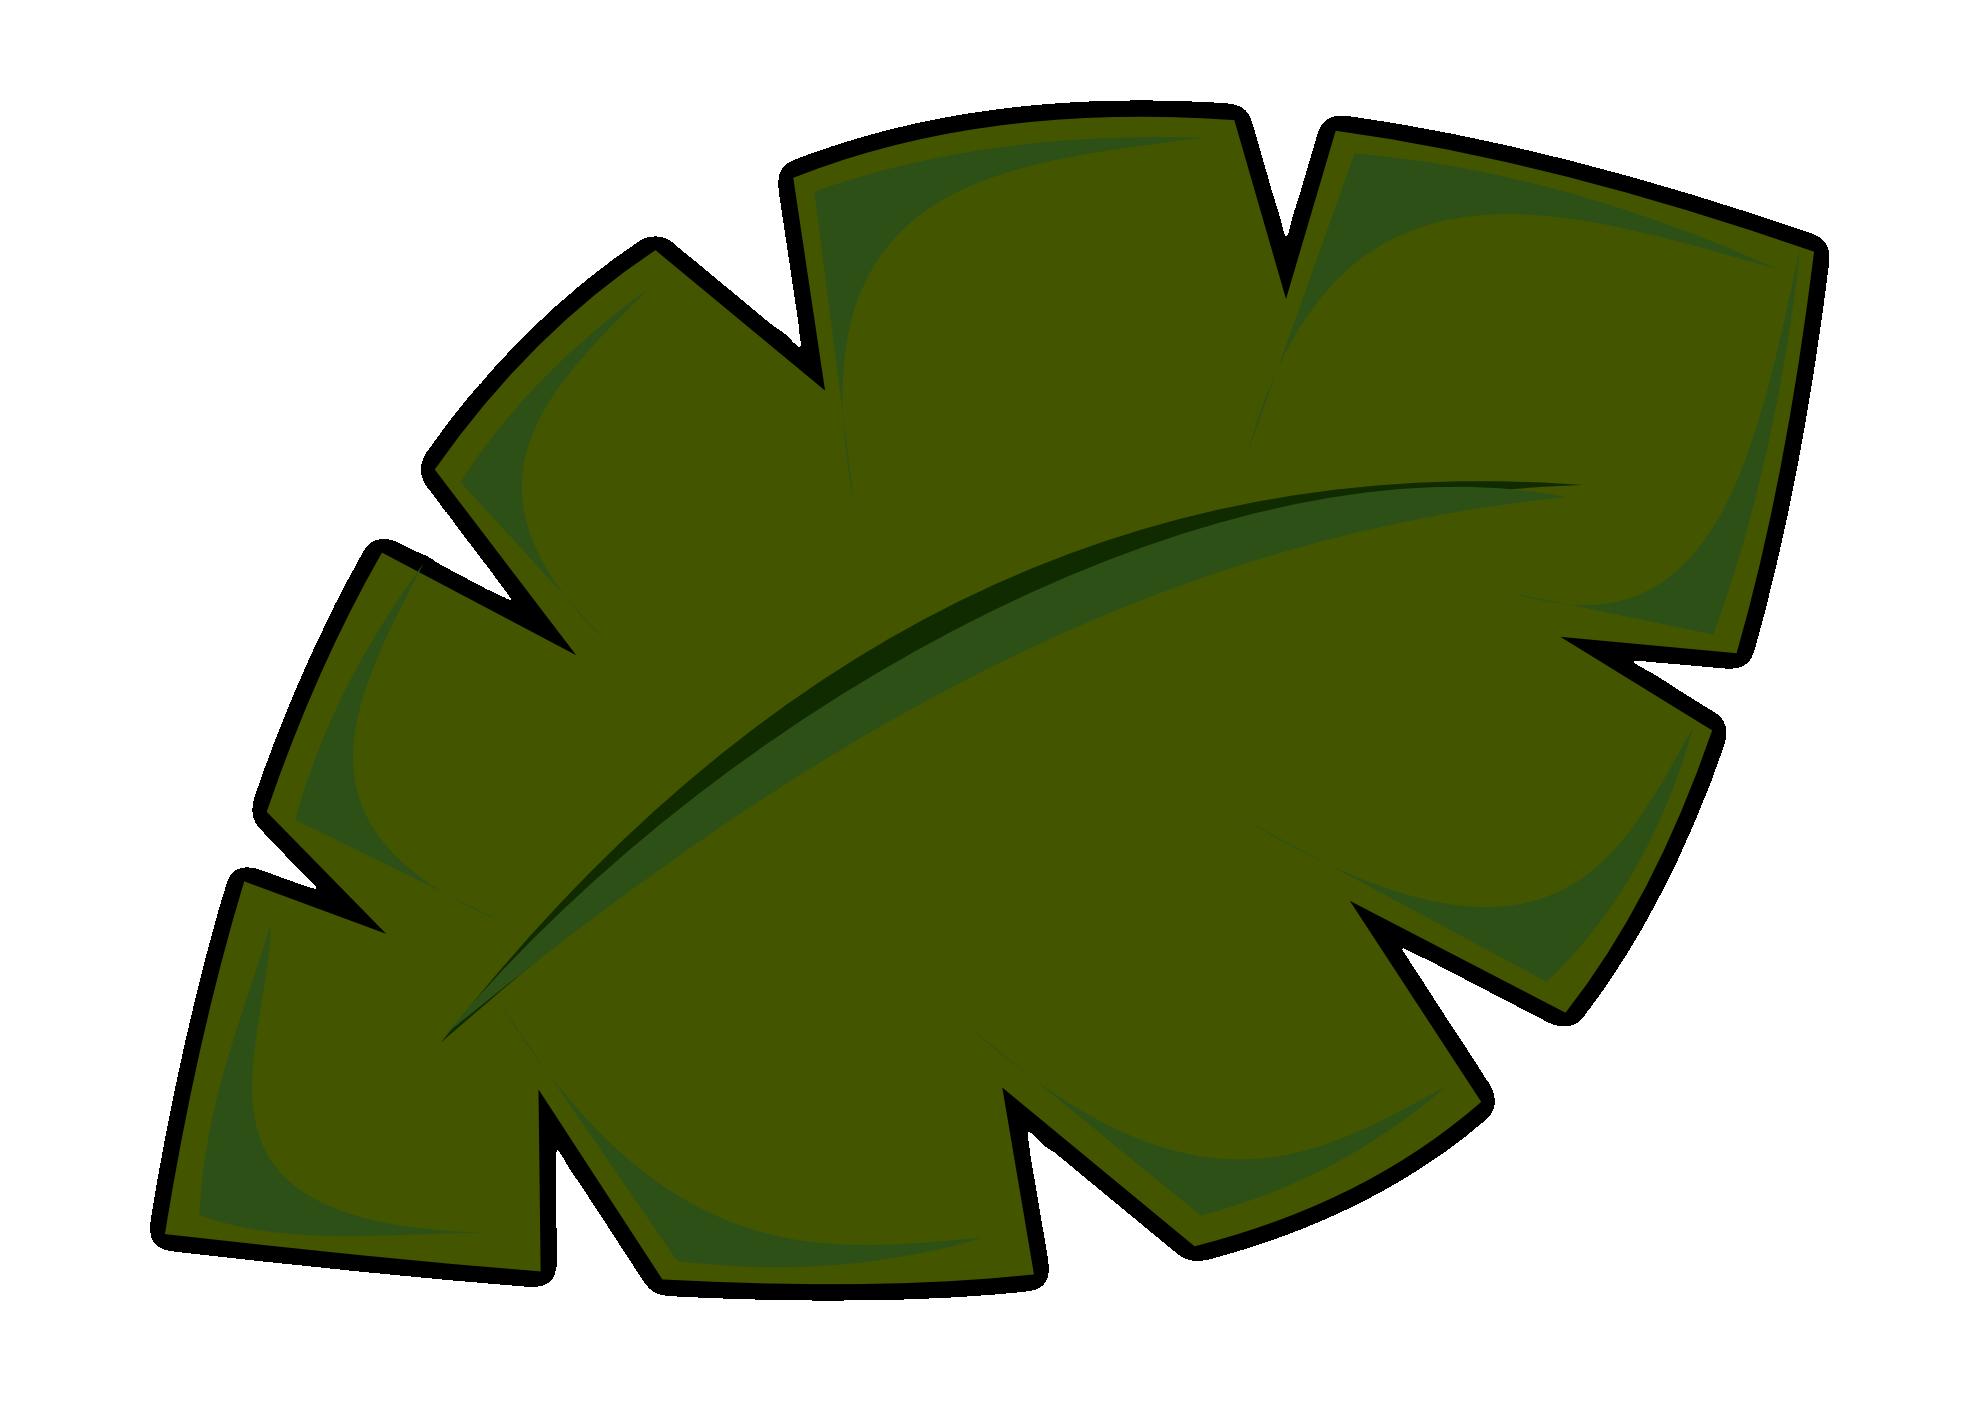 Jungle Leaf Printable - ClipArt Best